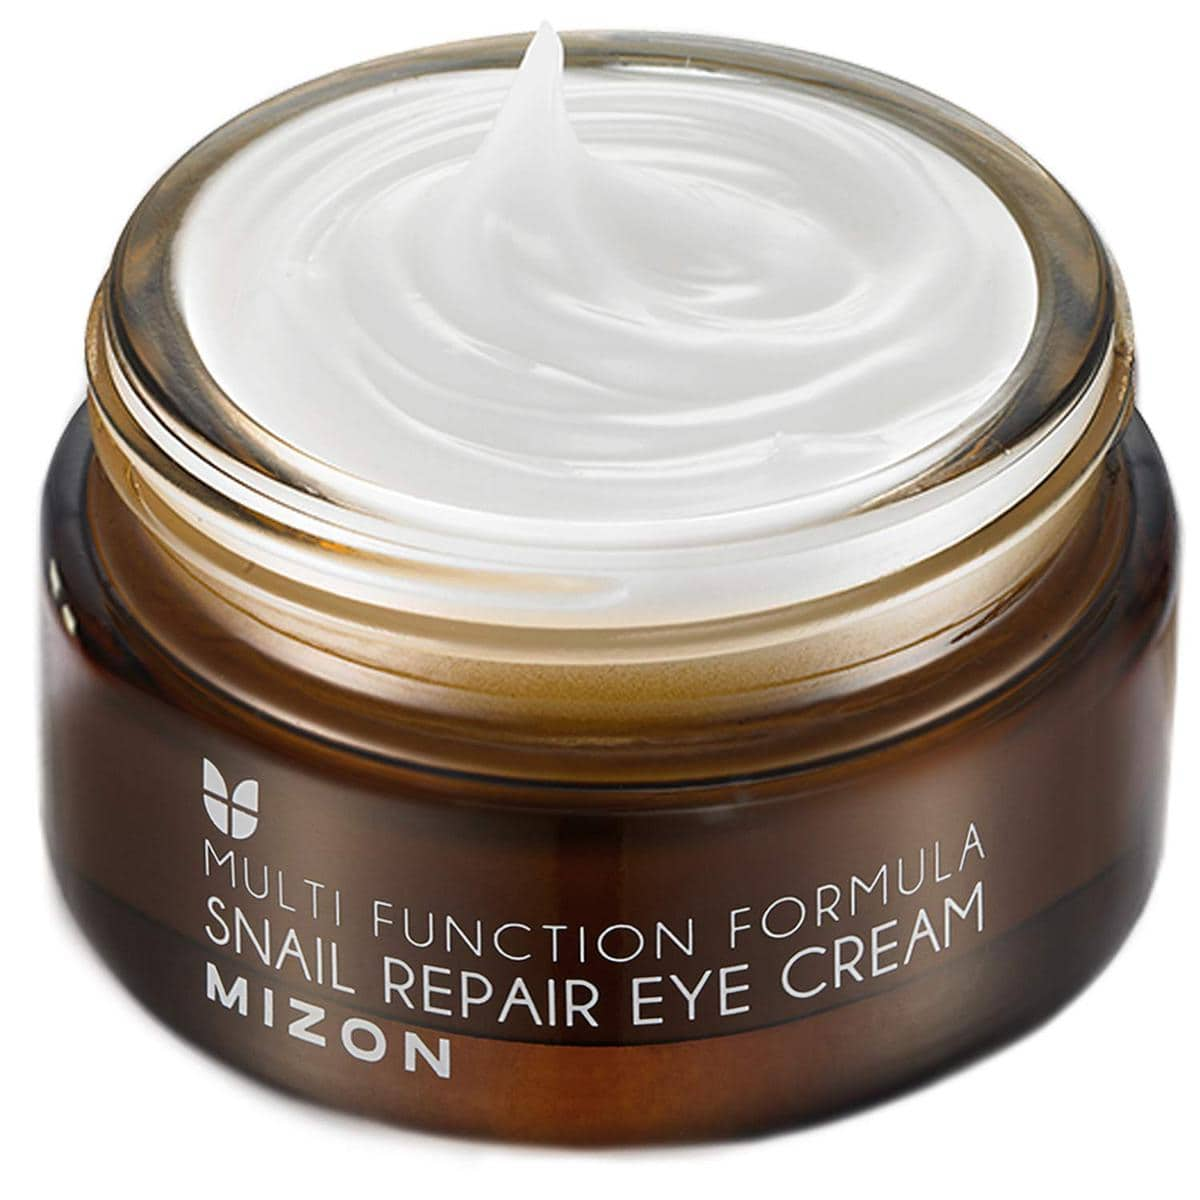 Mizon Snail Repair Eye Cream for wrinkles